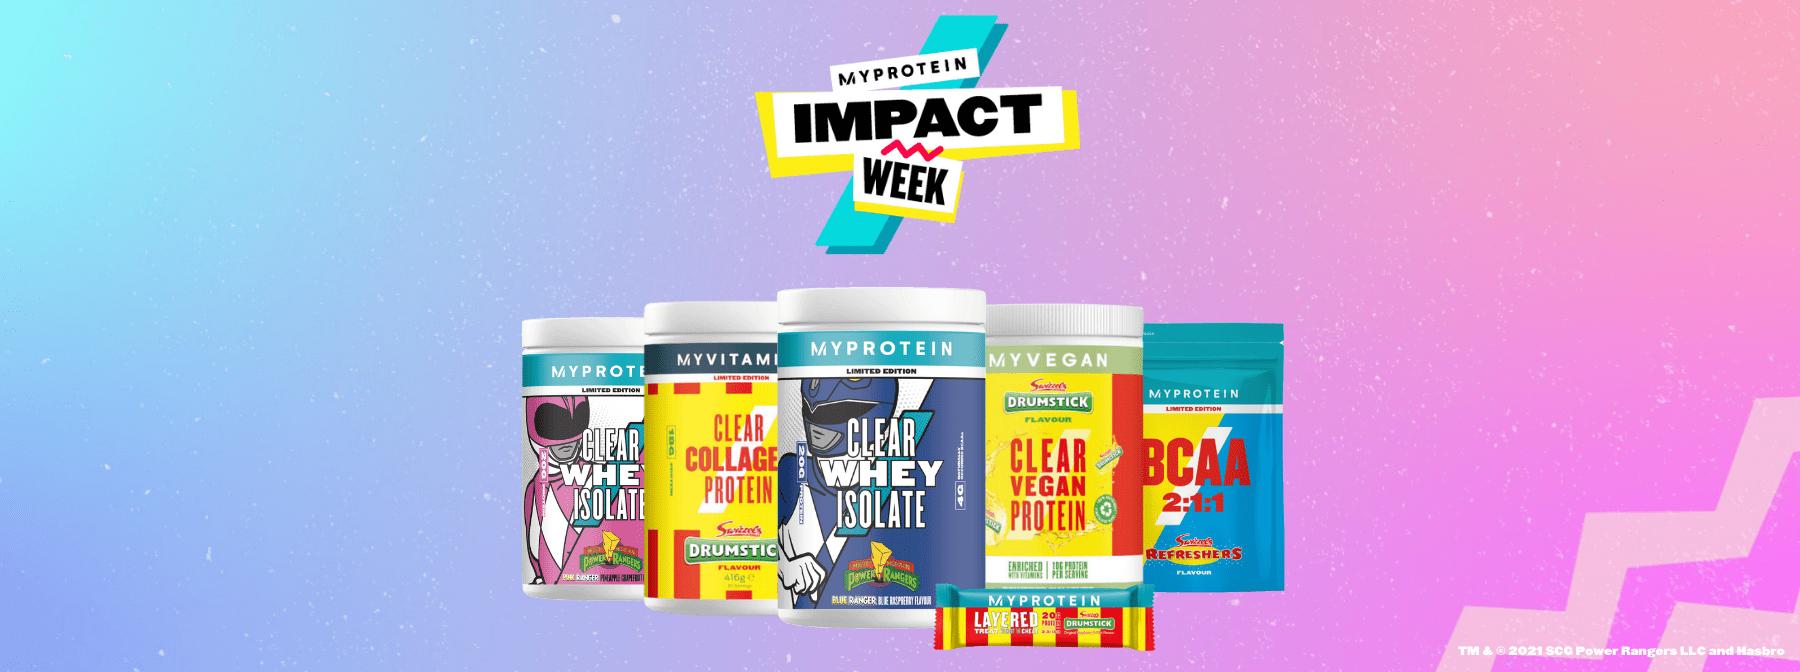 Impact Week   Scopri i nuovi prodotti